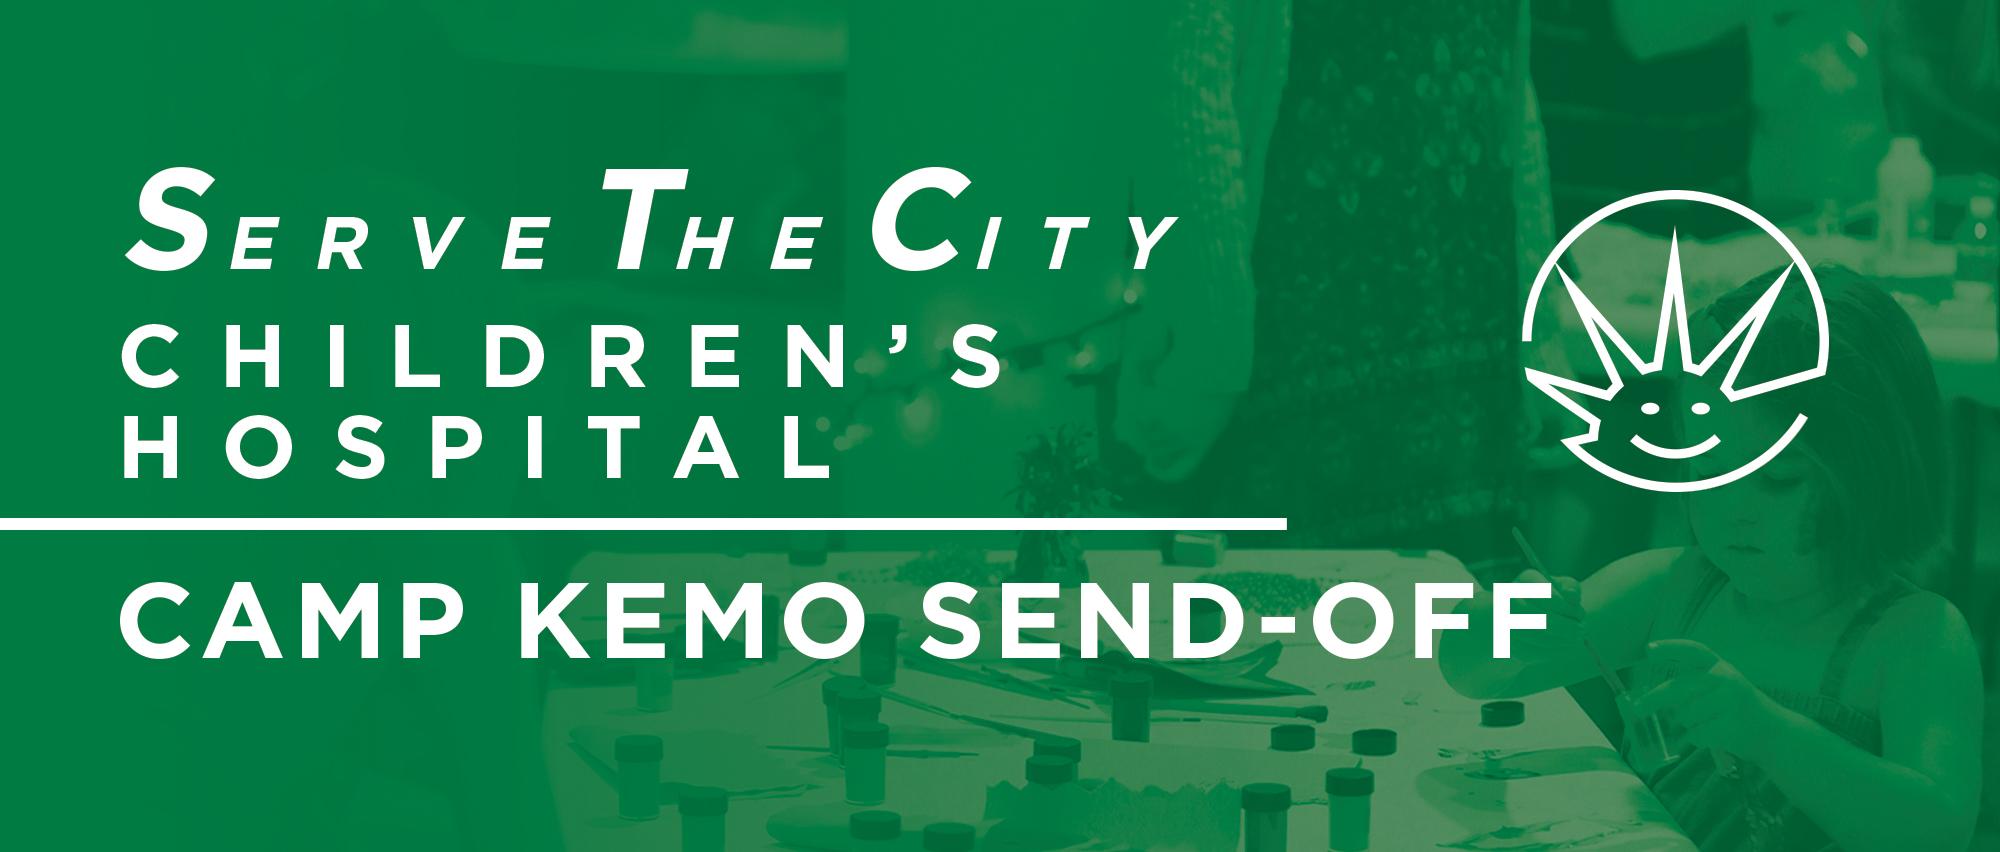 STC - Camp Kemo Send Web.jpg